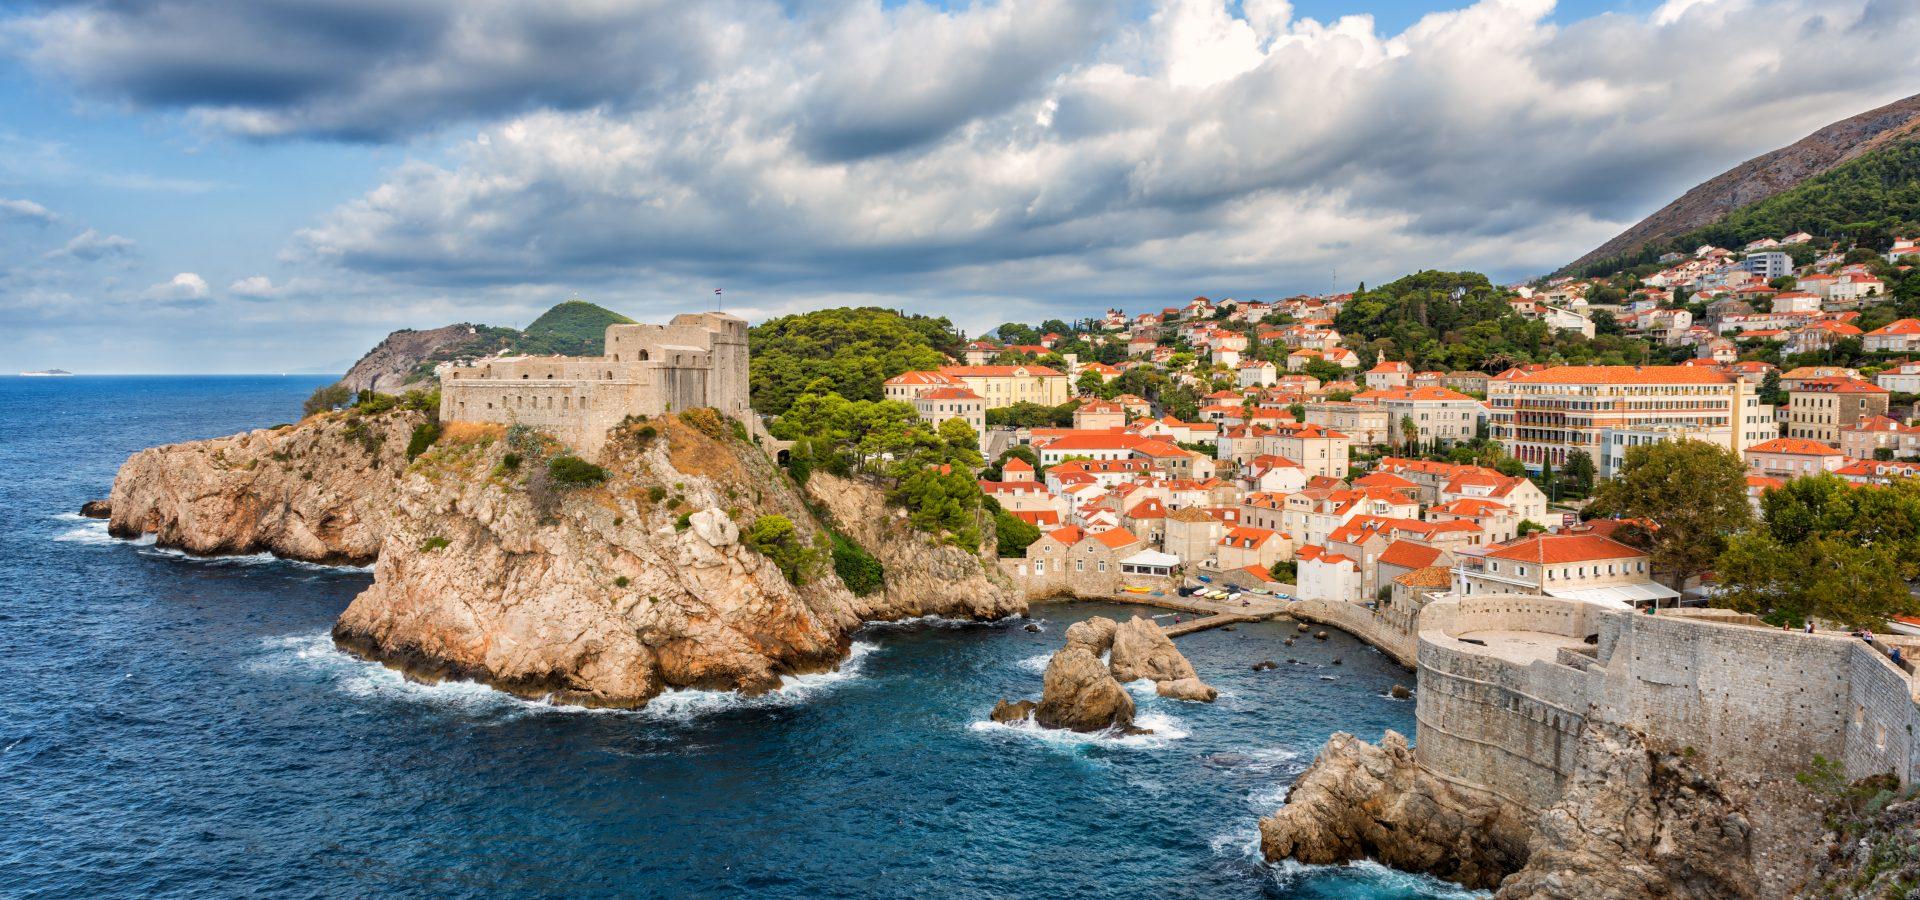 Dubrovnic, Croatia port in Europe